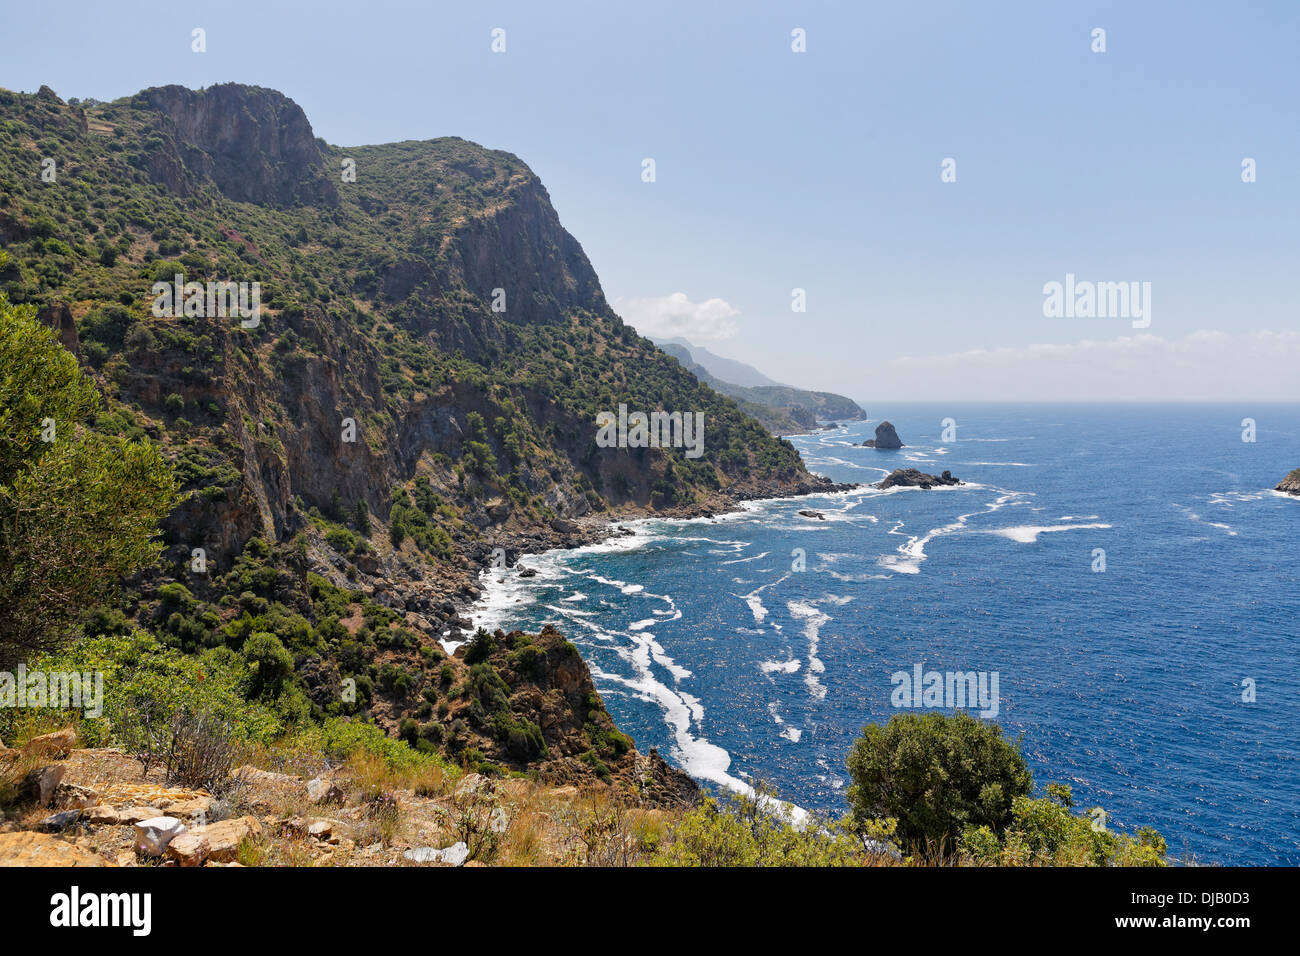 Antiochia ad Cragum, Gazipasa, Antalya province, Riviera turque, Turquie Photo Stock